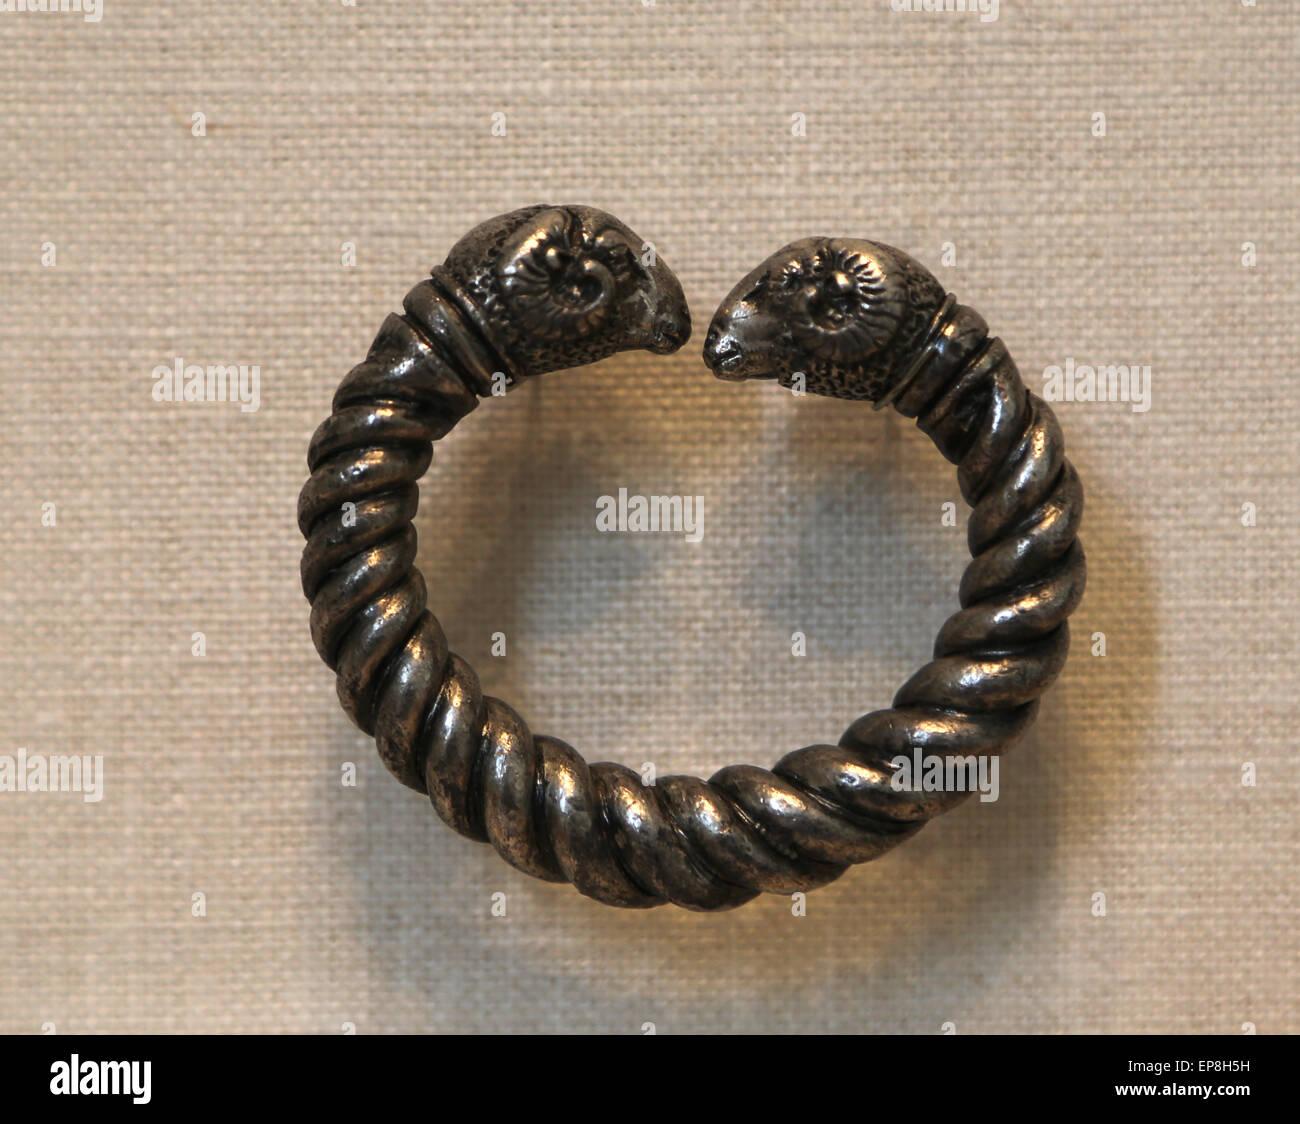 Silver bracelet with ram's head finials. Greek, late 4th century B.C. Metropolitan Museum of Art. Ny. USA. - Stock Image